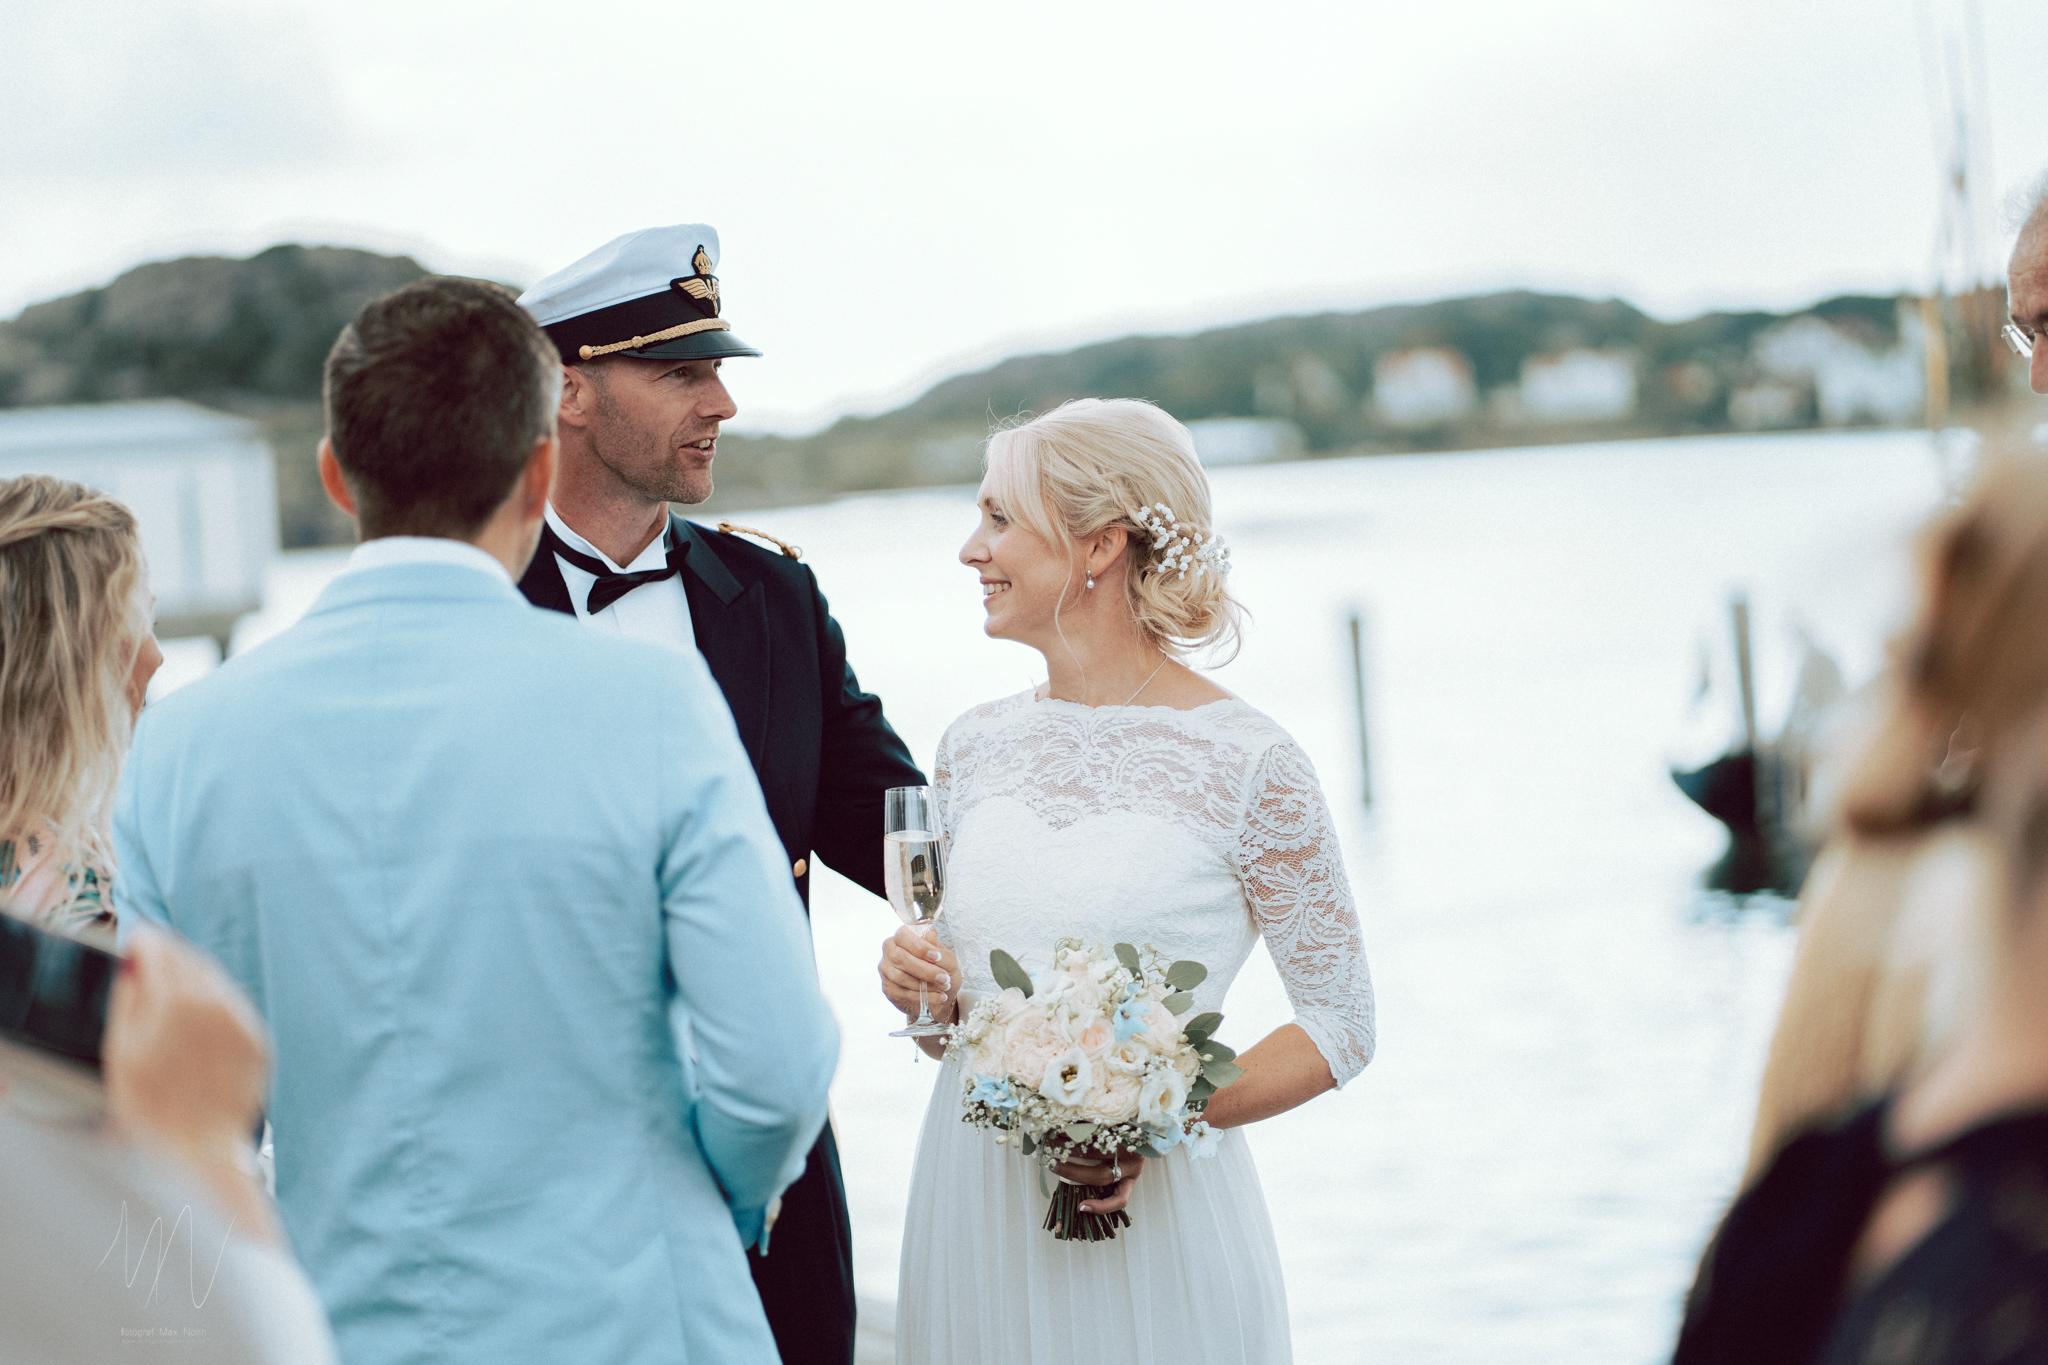 Bröllop-fotografmaxnorin.se-MariaMarcus-279.JPG